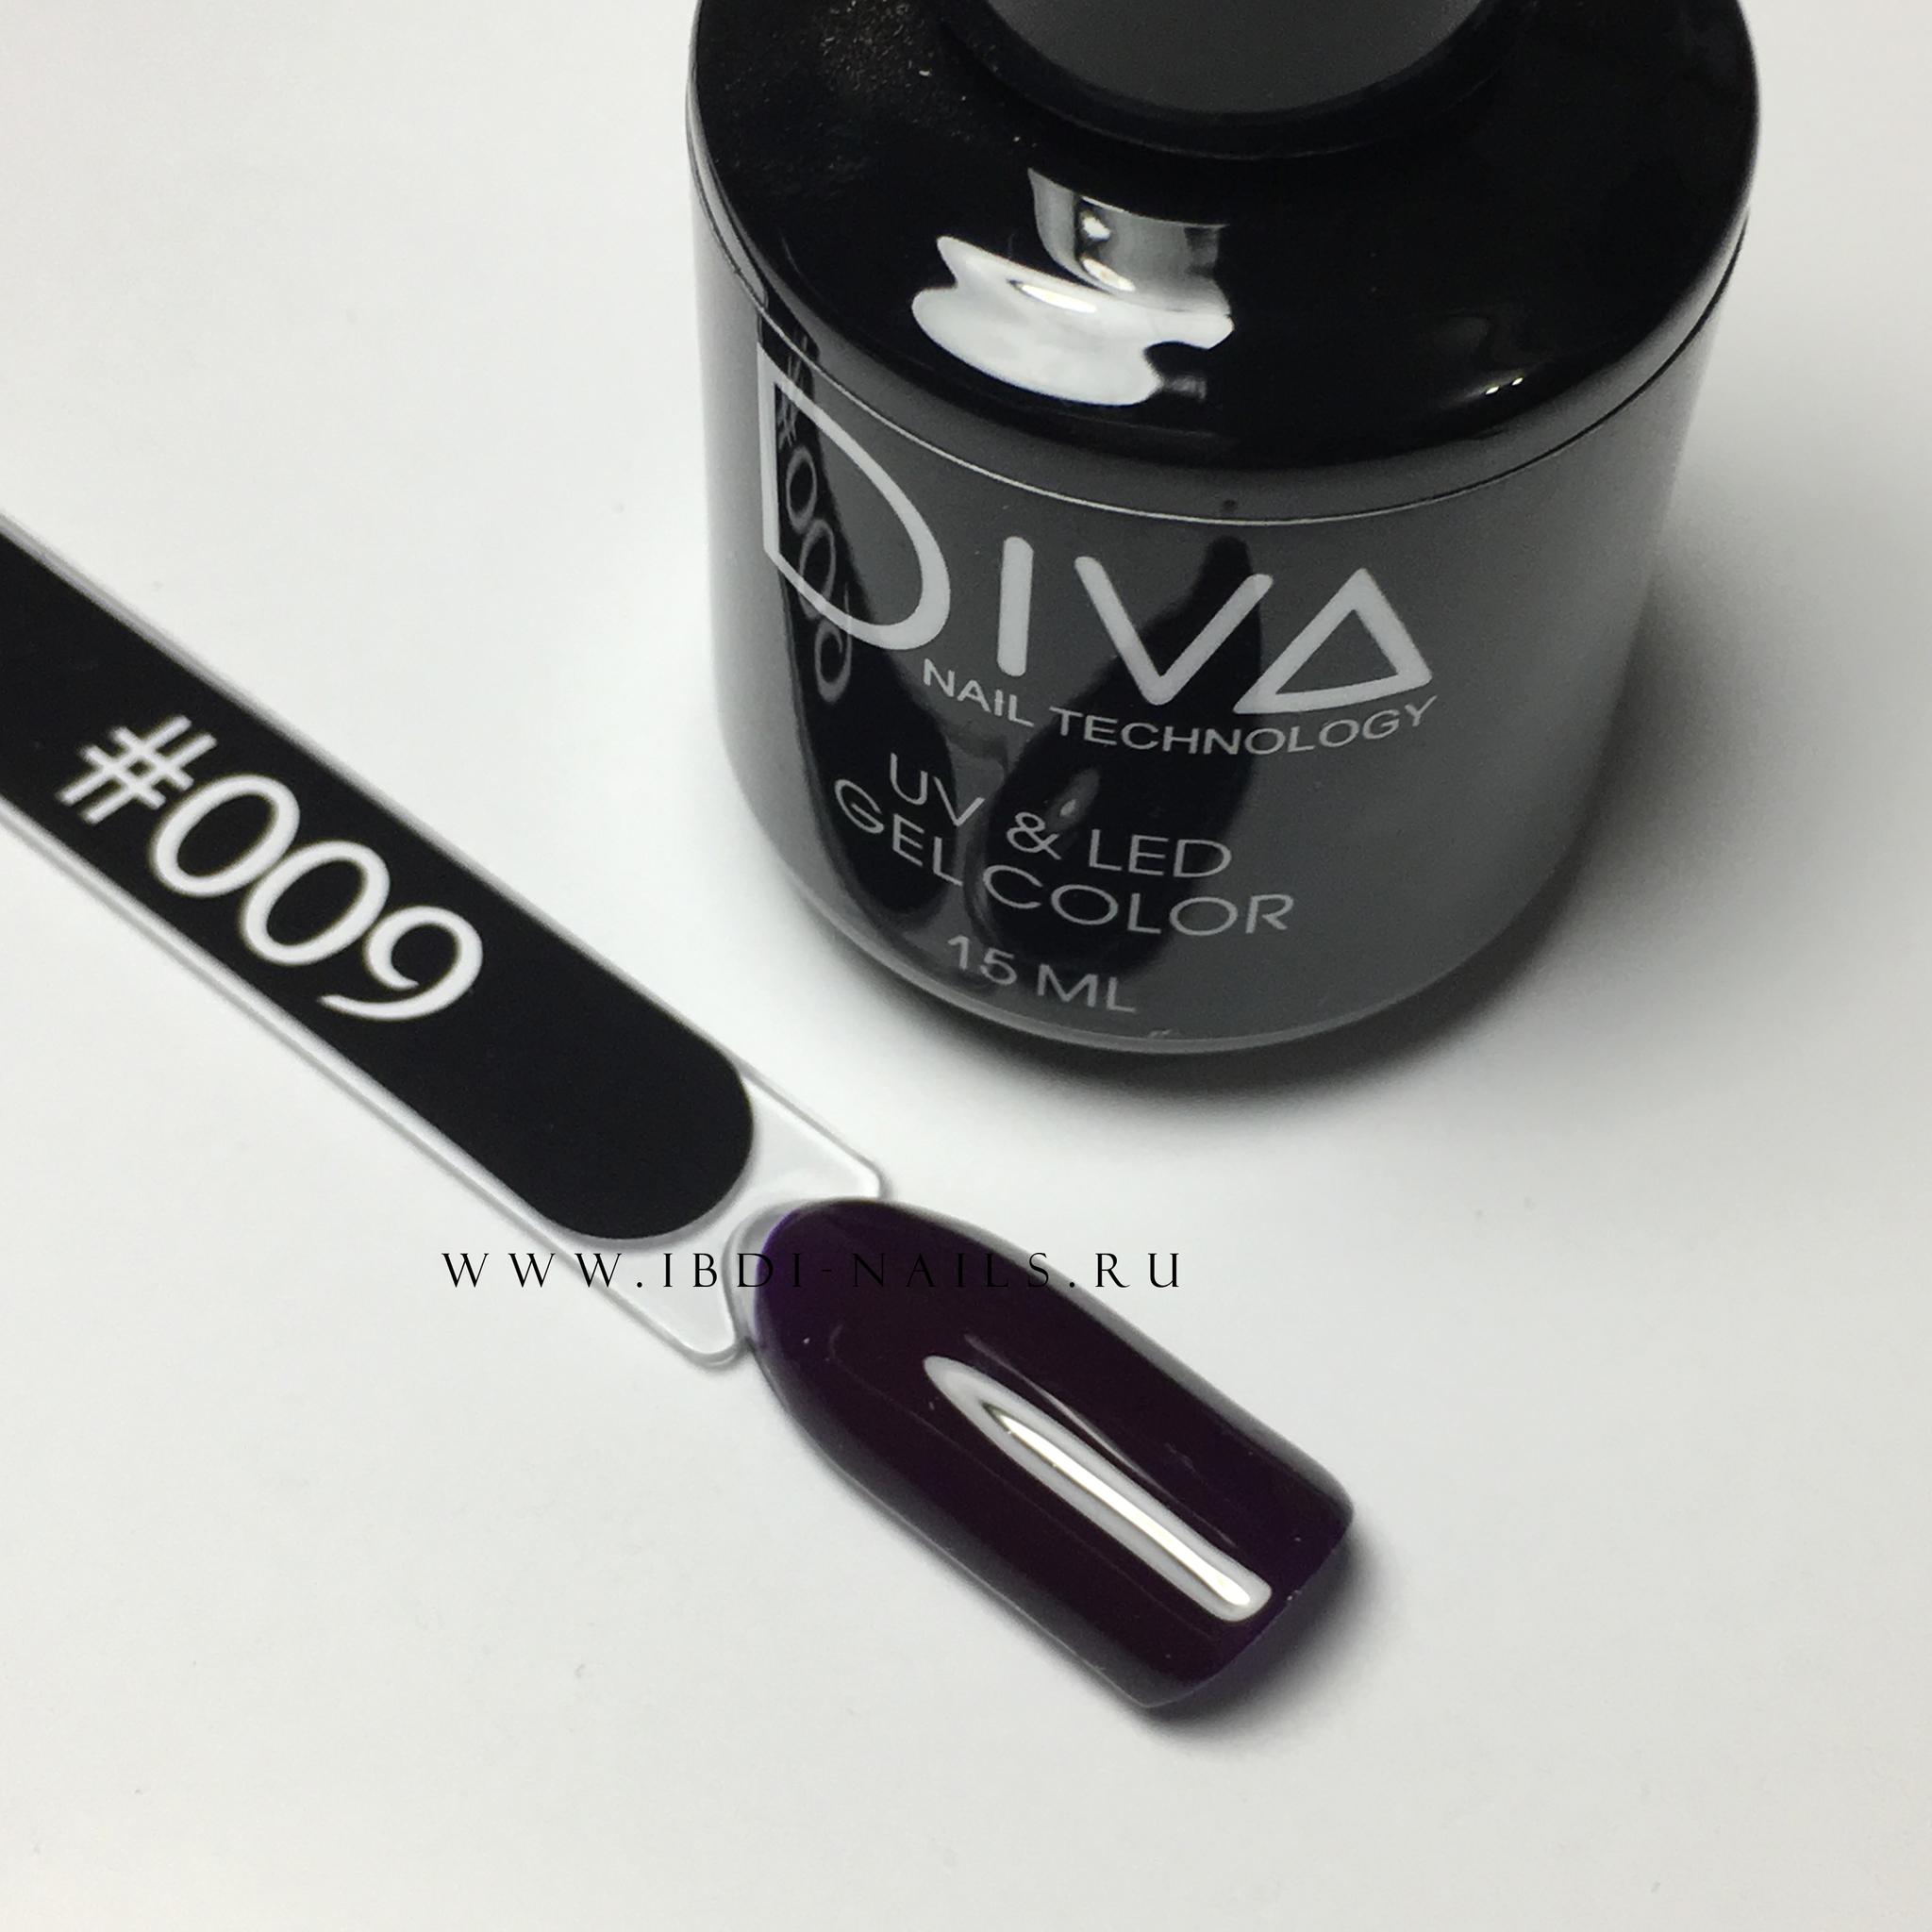 Гель-лак DIVA 009 15мл